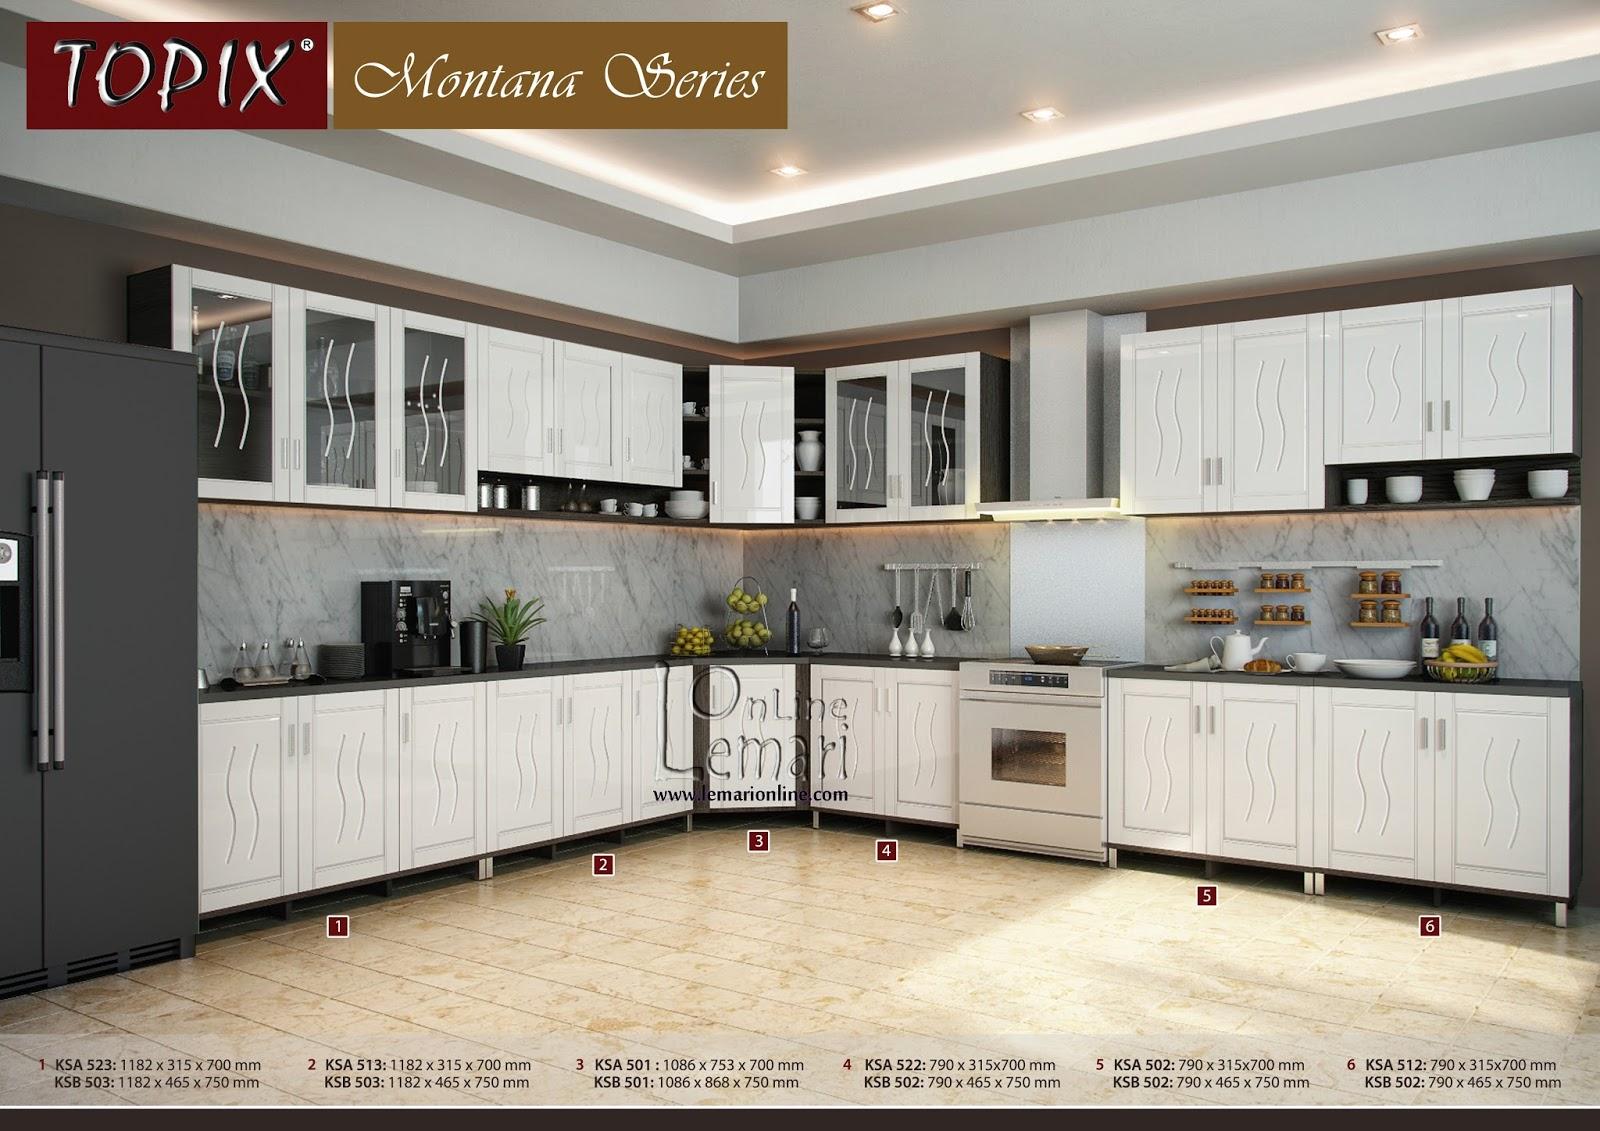 Lemari online kitchen set for Lemari kitchen